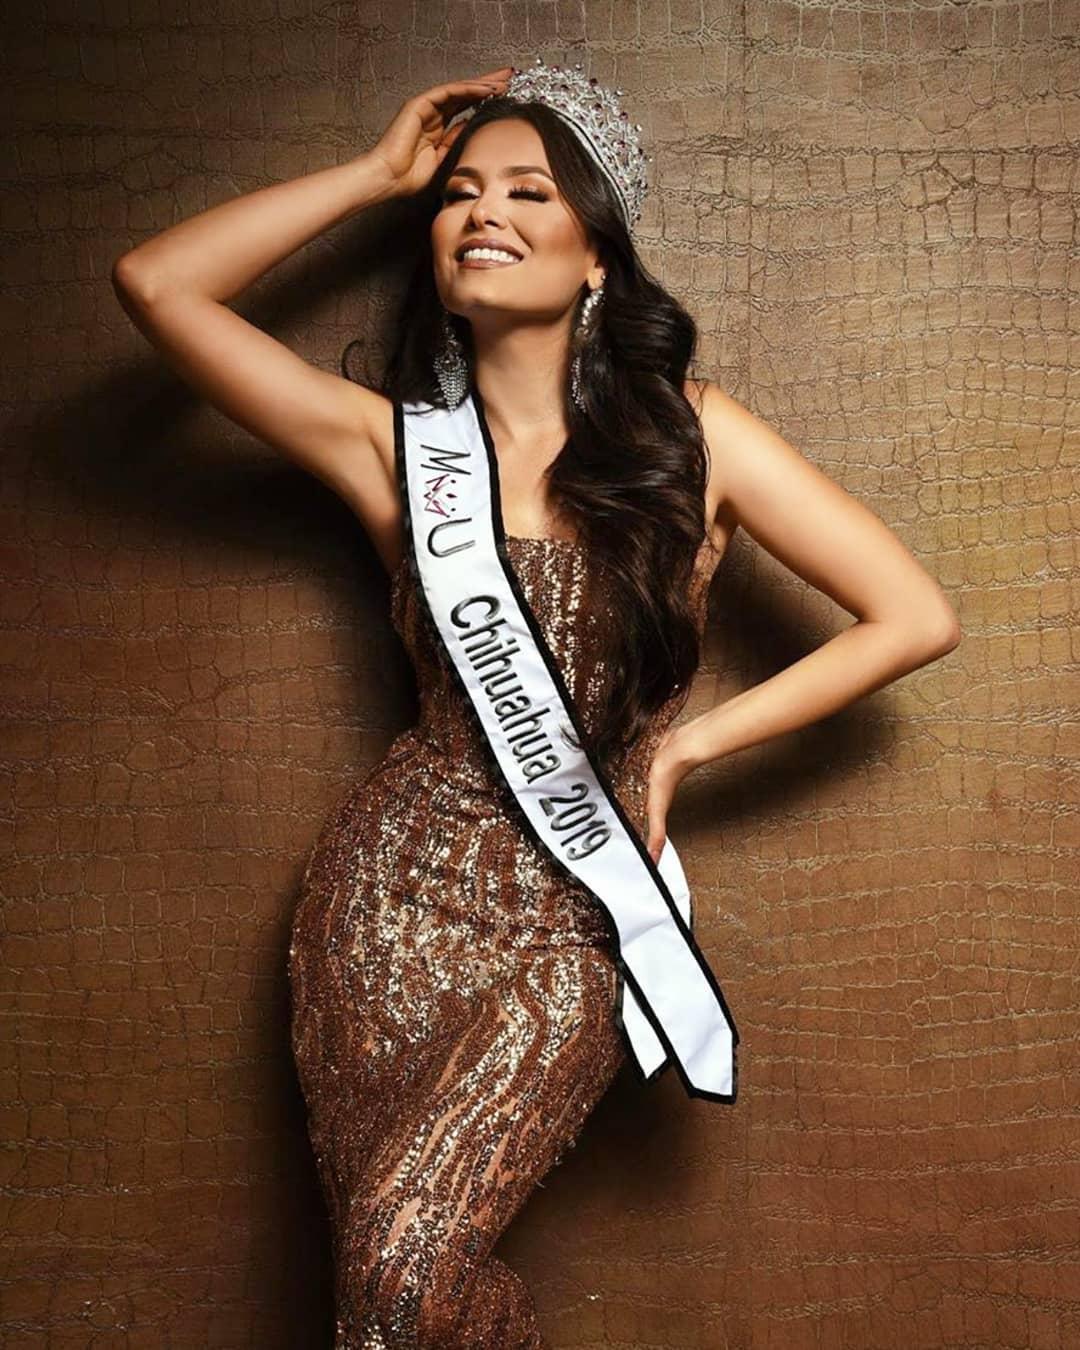 andrea meza, mexicana universal chihuahua 2020/1st runner-up de miss world 2017. - Página 41 81026910